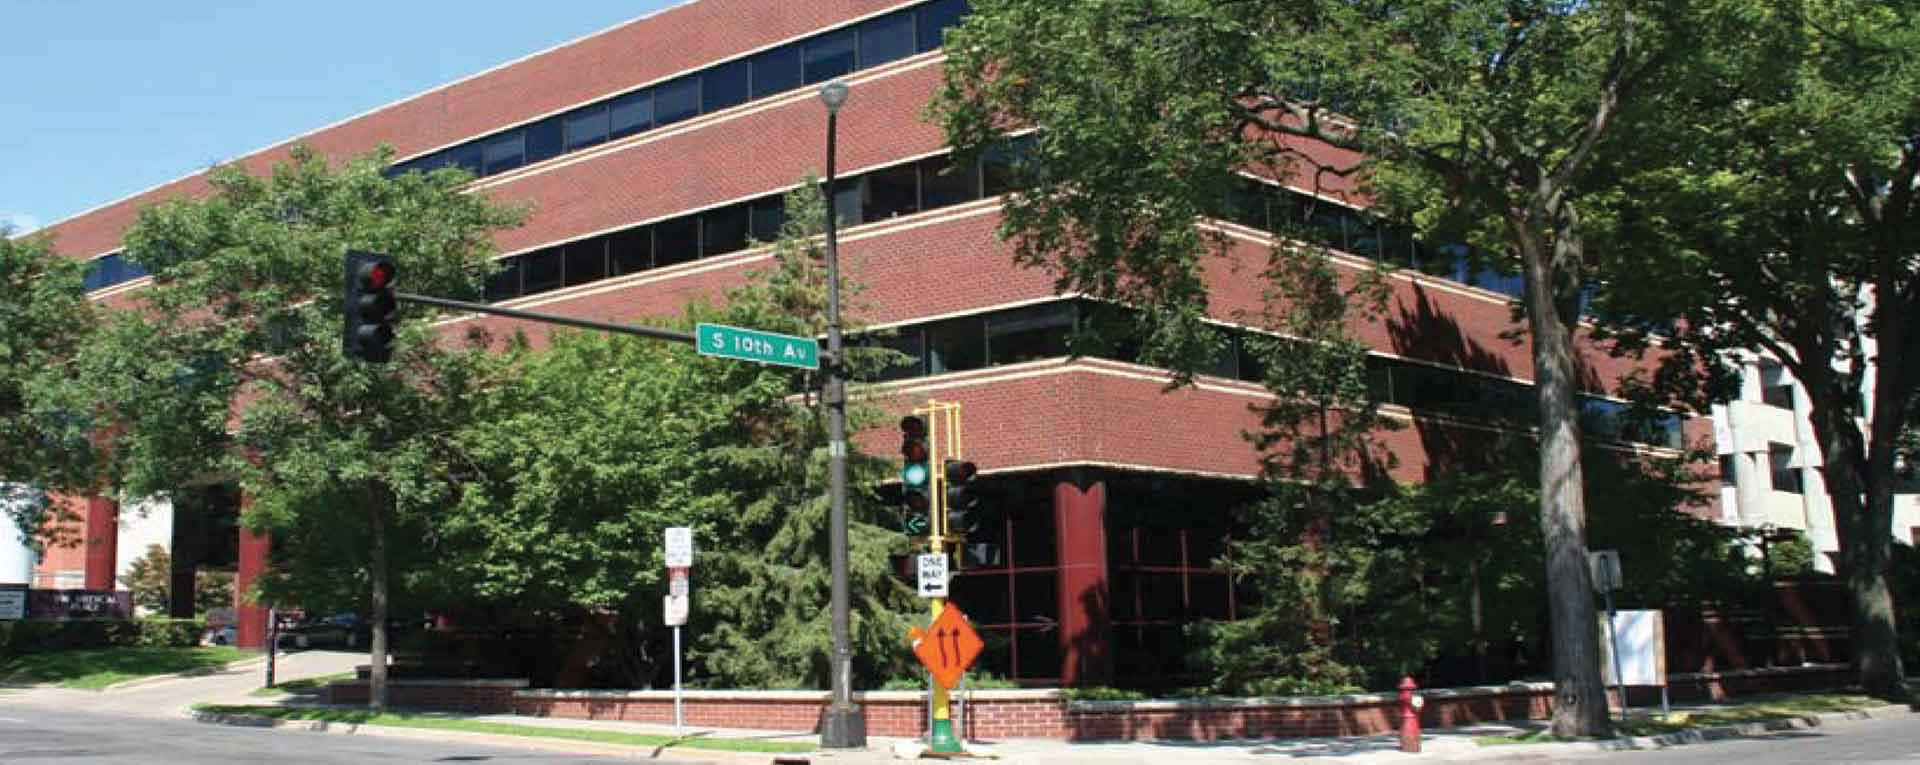 910 Medical Building - Minneapolis, MN